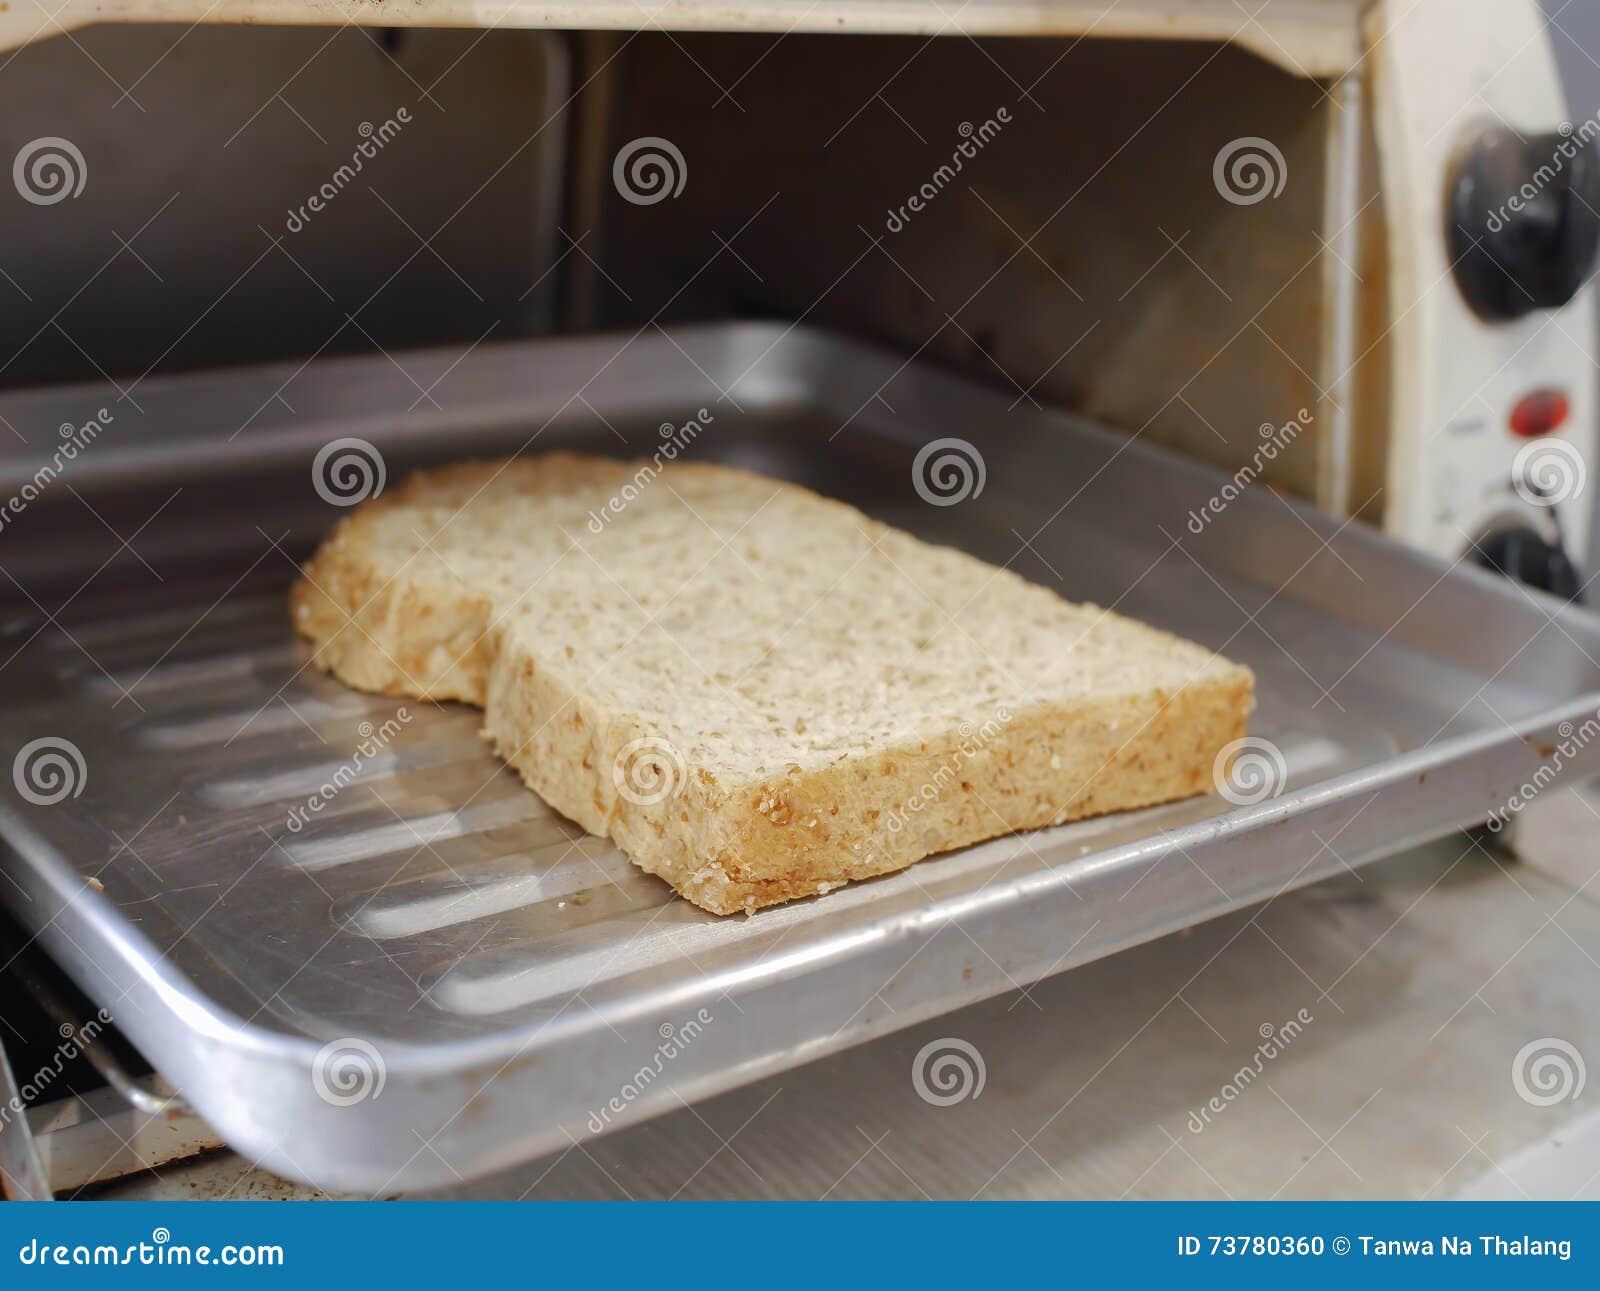 toastbrot gegrillt vom ofen stockfoto bild 73780360. Black Bedroom Furniture Sets. Home Design Ideas